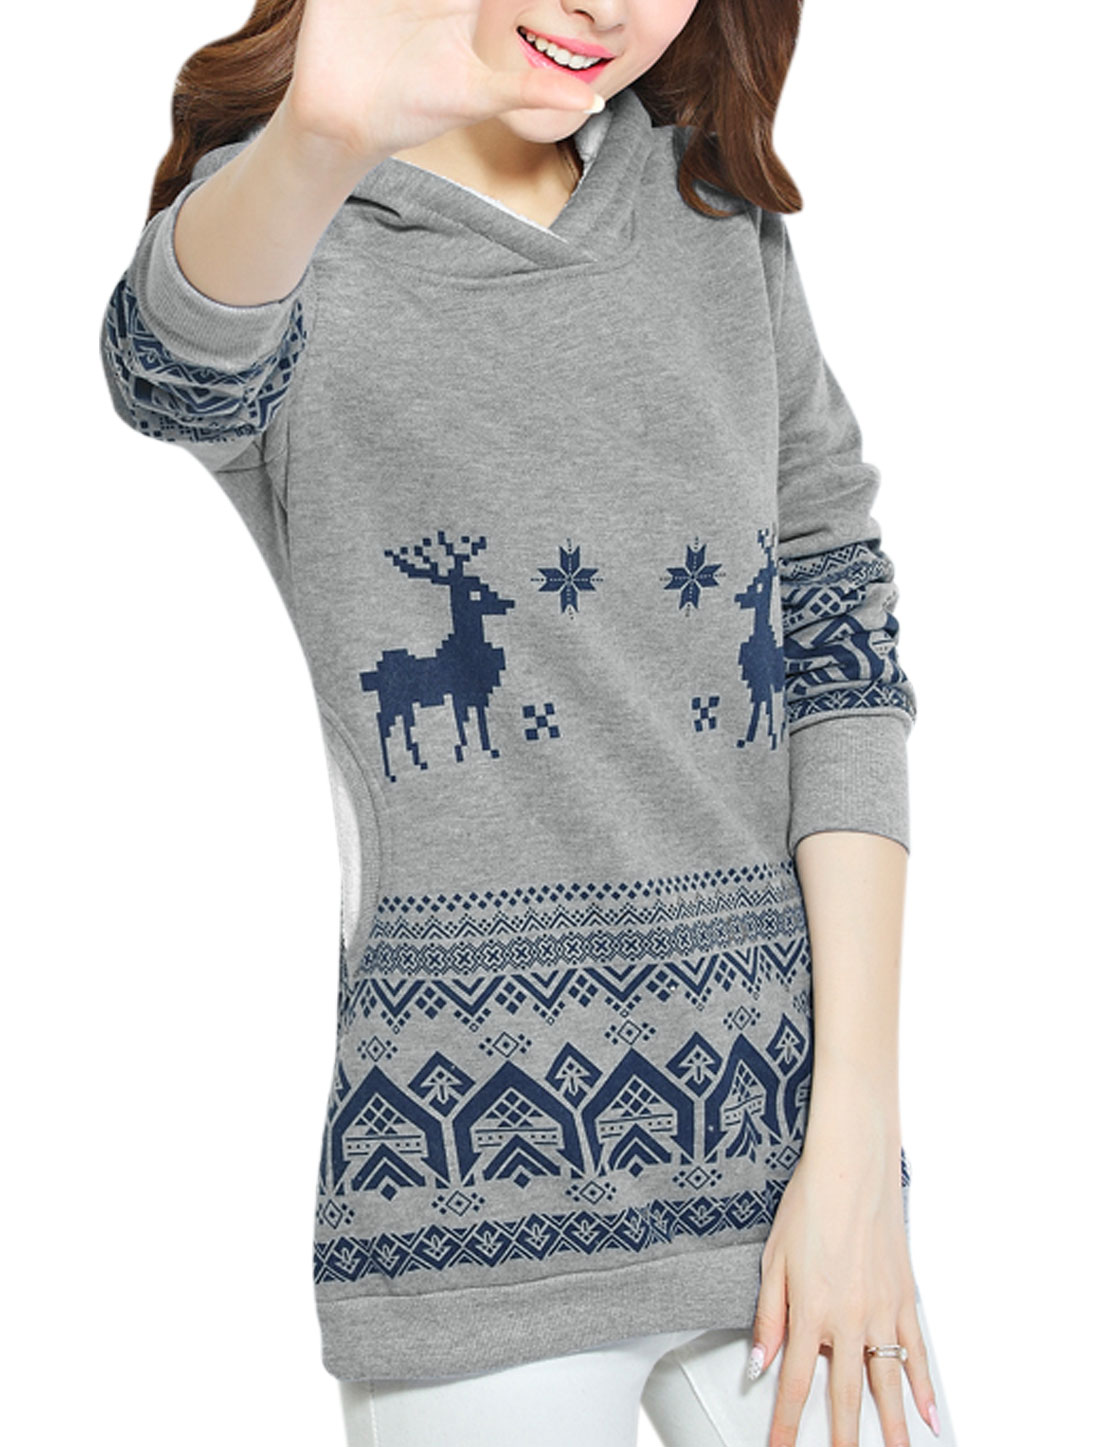 Geometric Printed Long Sleeves Casual Tunic Sweatshirt for Women Gray XS